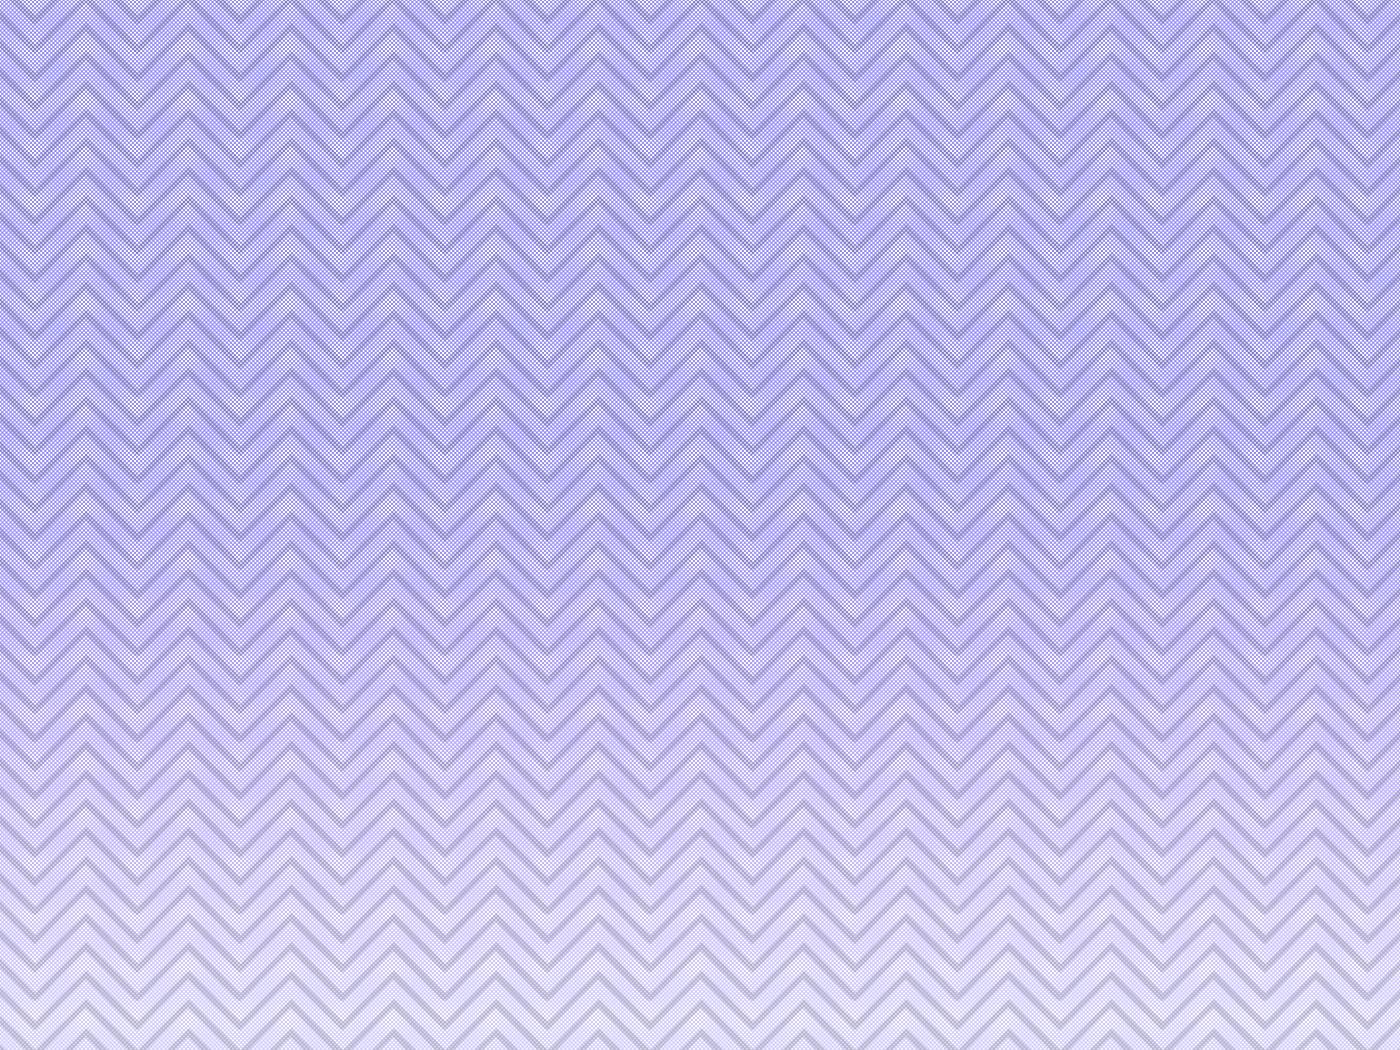 Zig Zag Wallpaper images for your desktop Images for 1400x1050